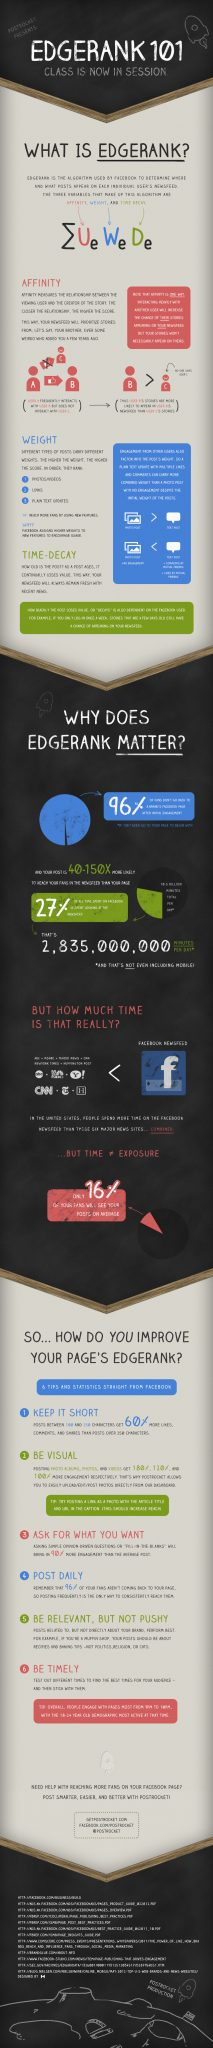 Facebook Newsfeed Algorithm - How Edgerank Works Infographic